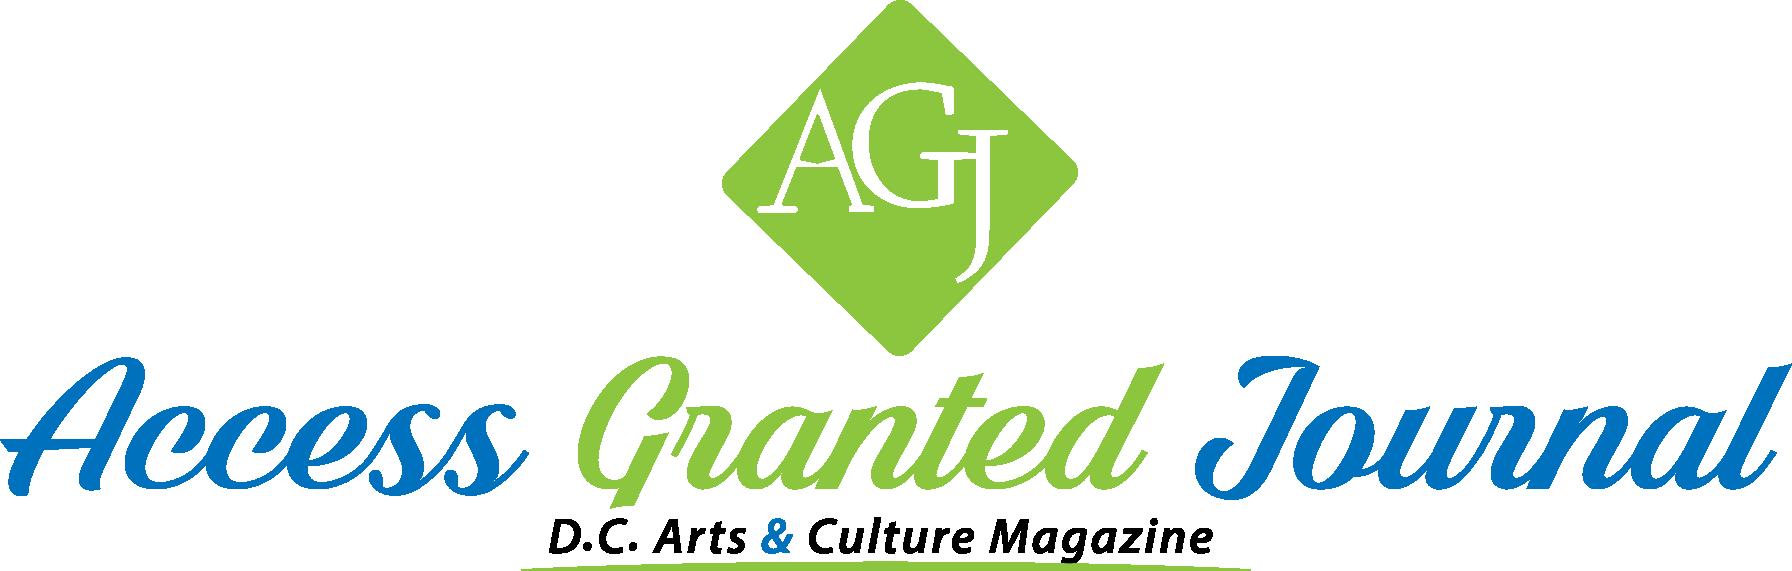 AGI Magazine